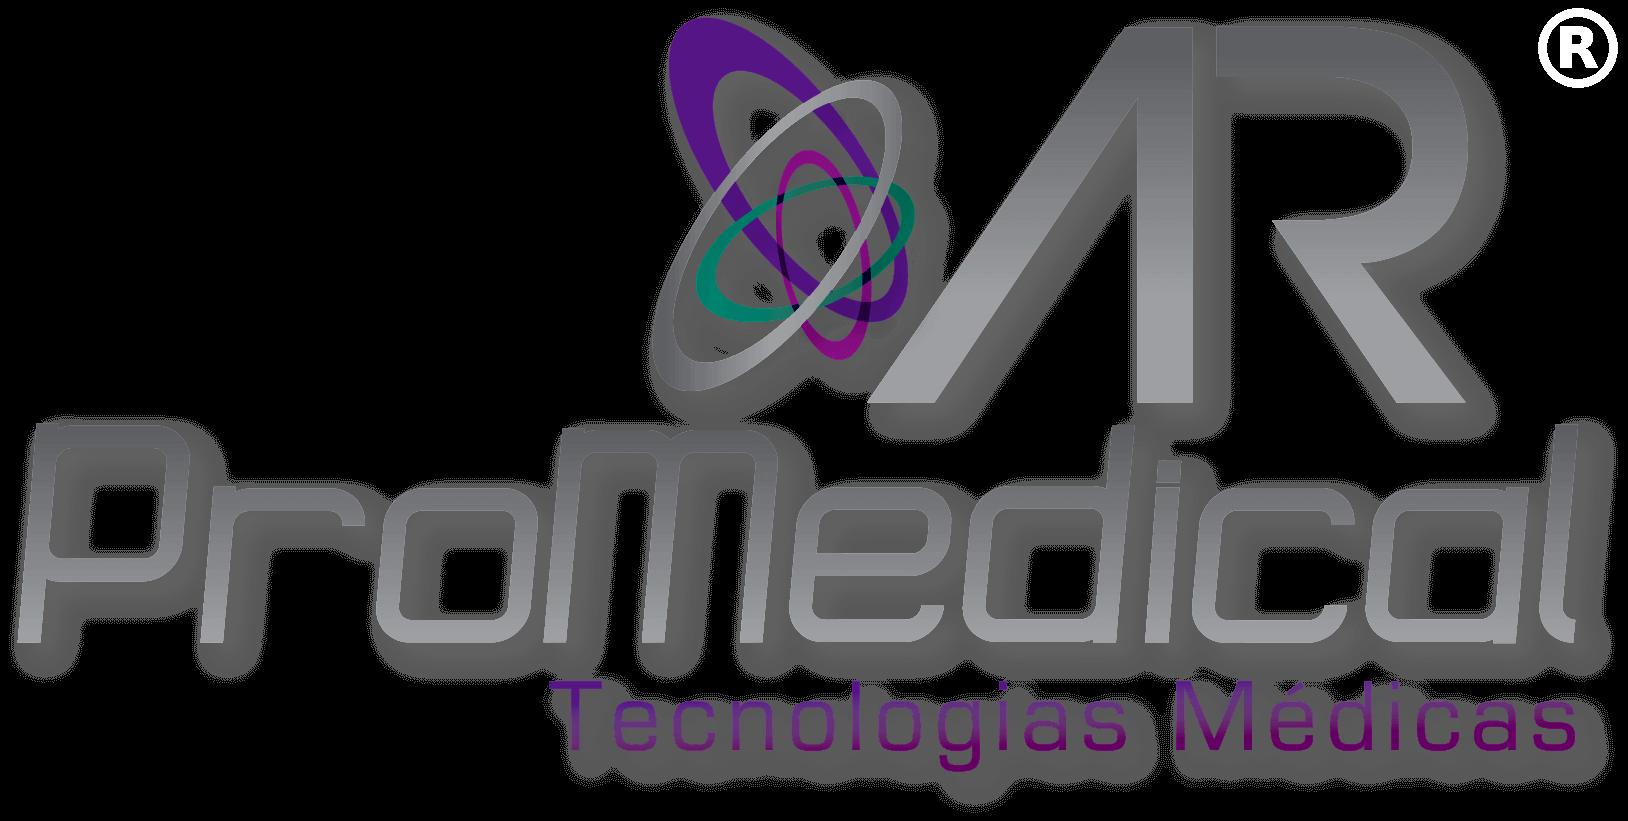 logo_(marca_registrada)